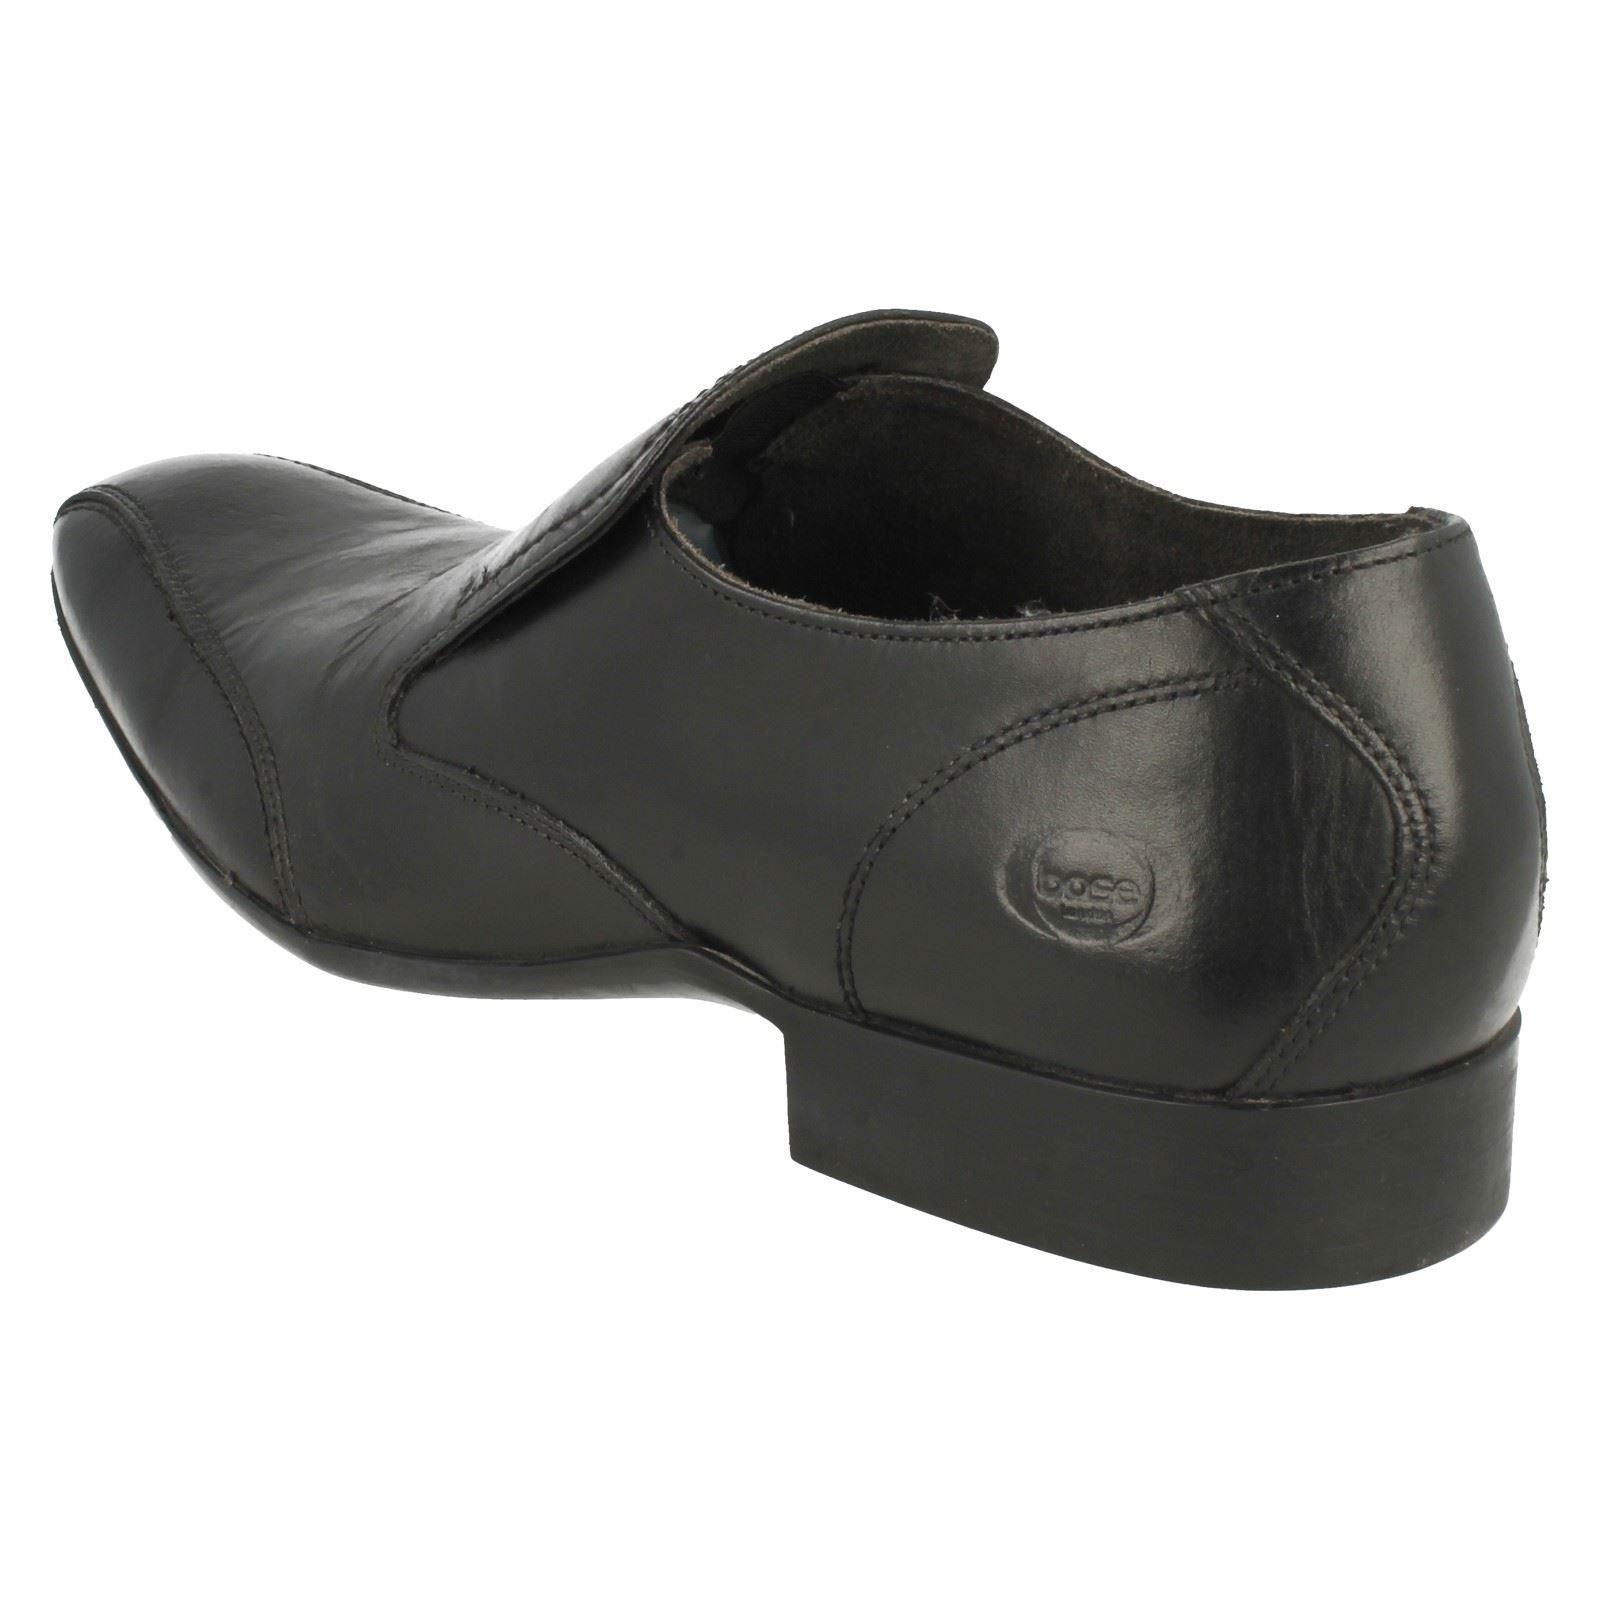 Mens Base London Slip On Shoes Hollow